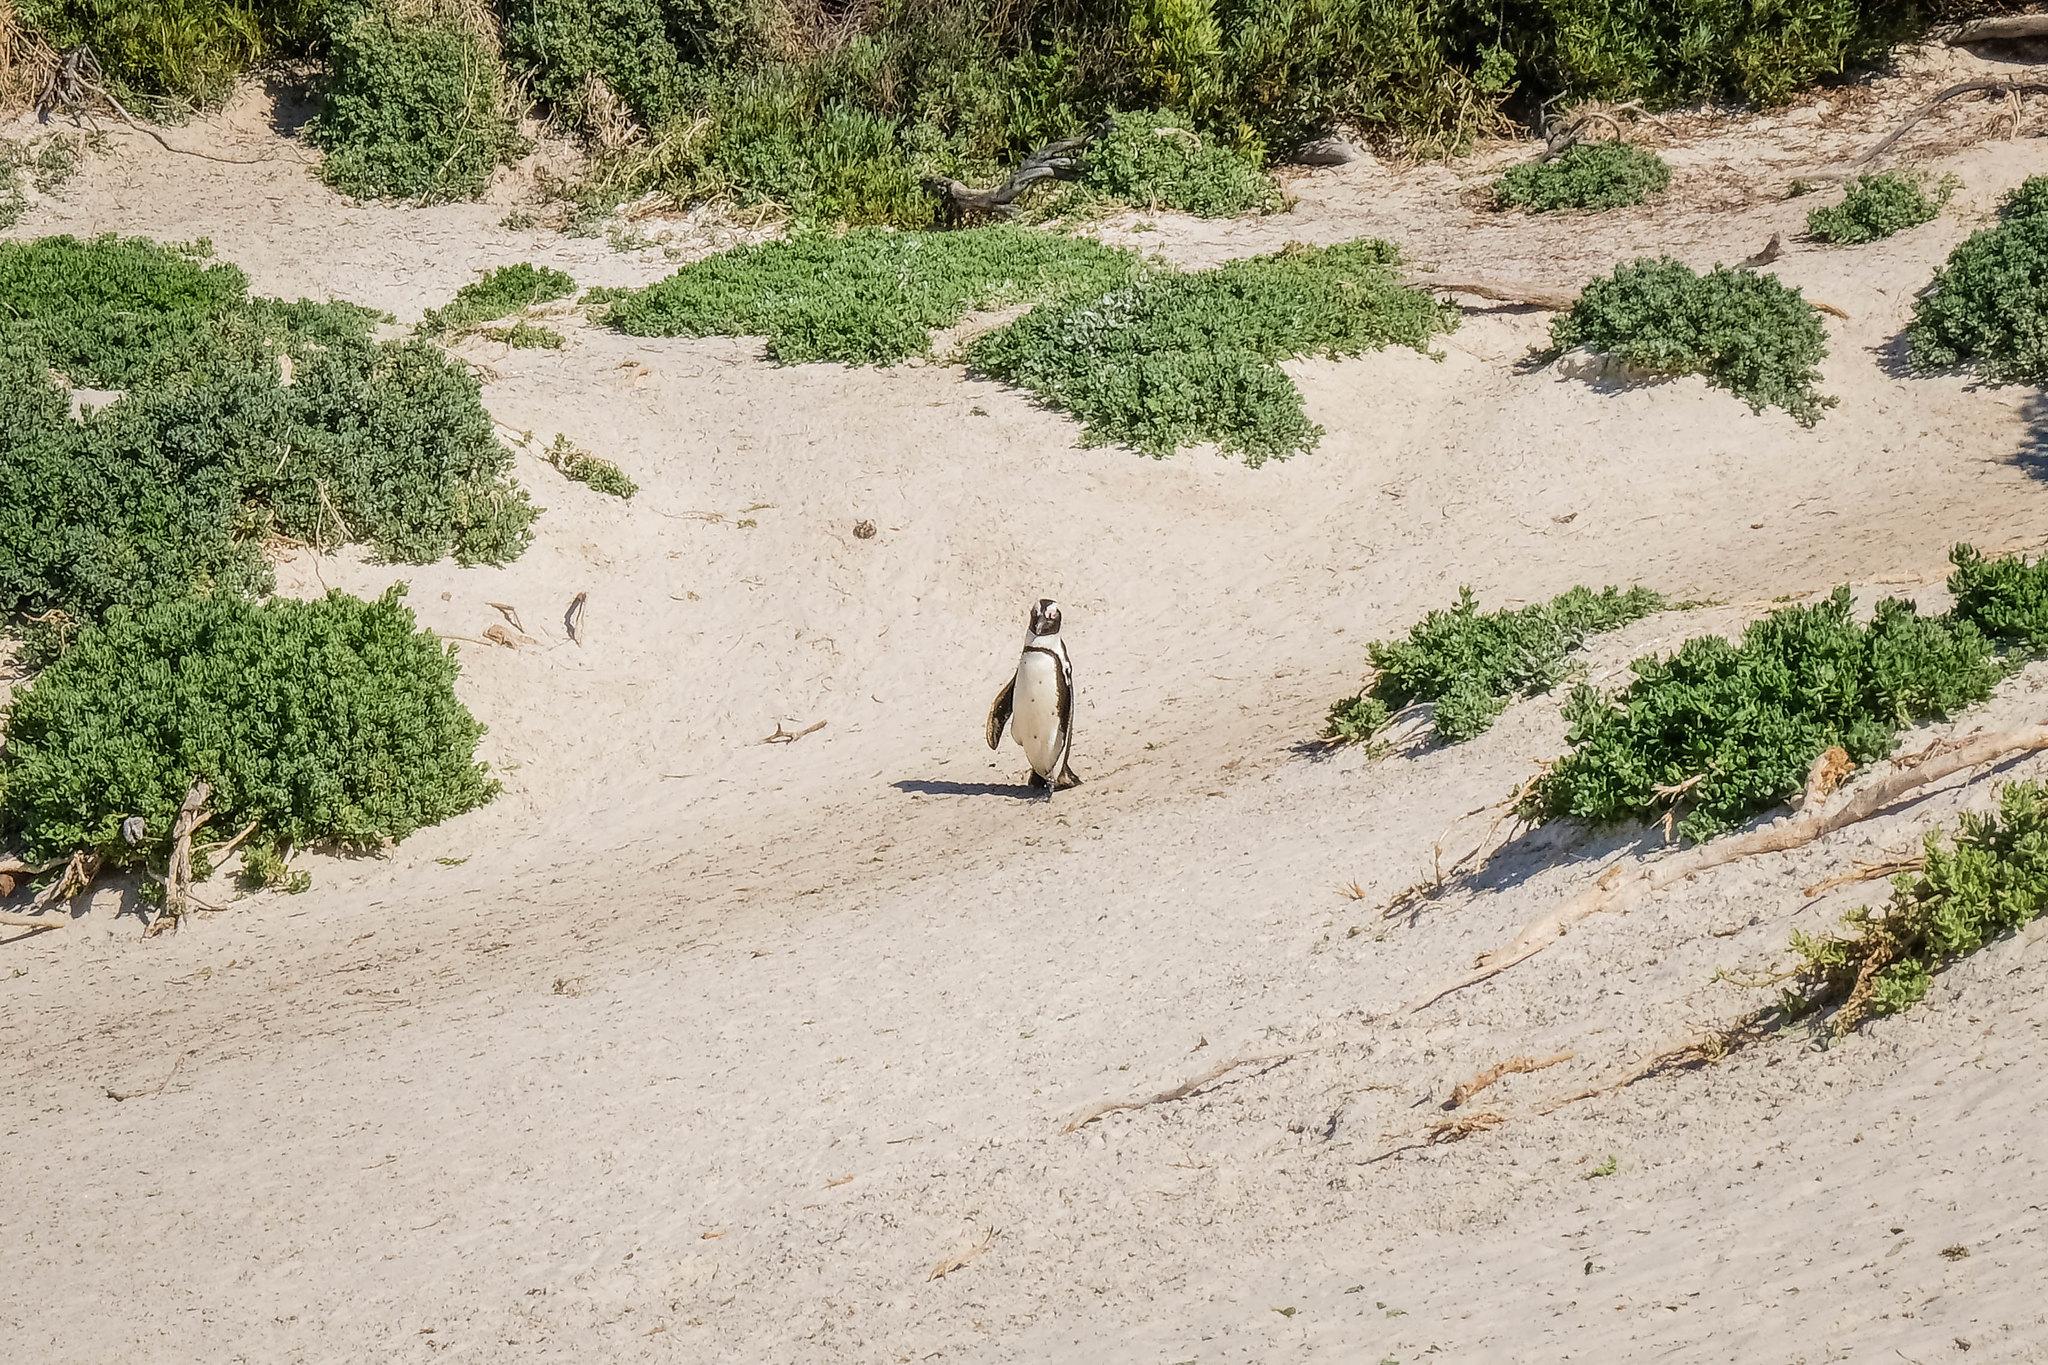 Penguins at Boulders Beach!